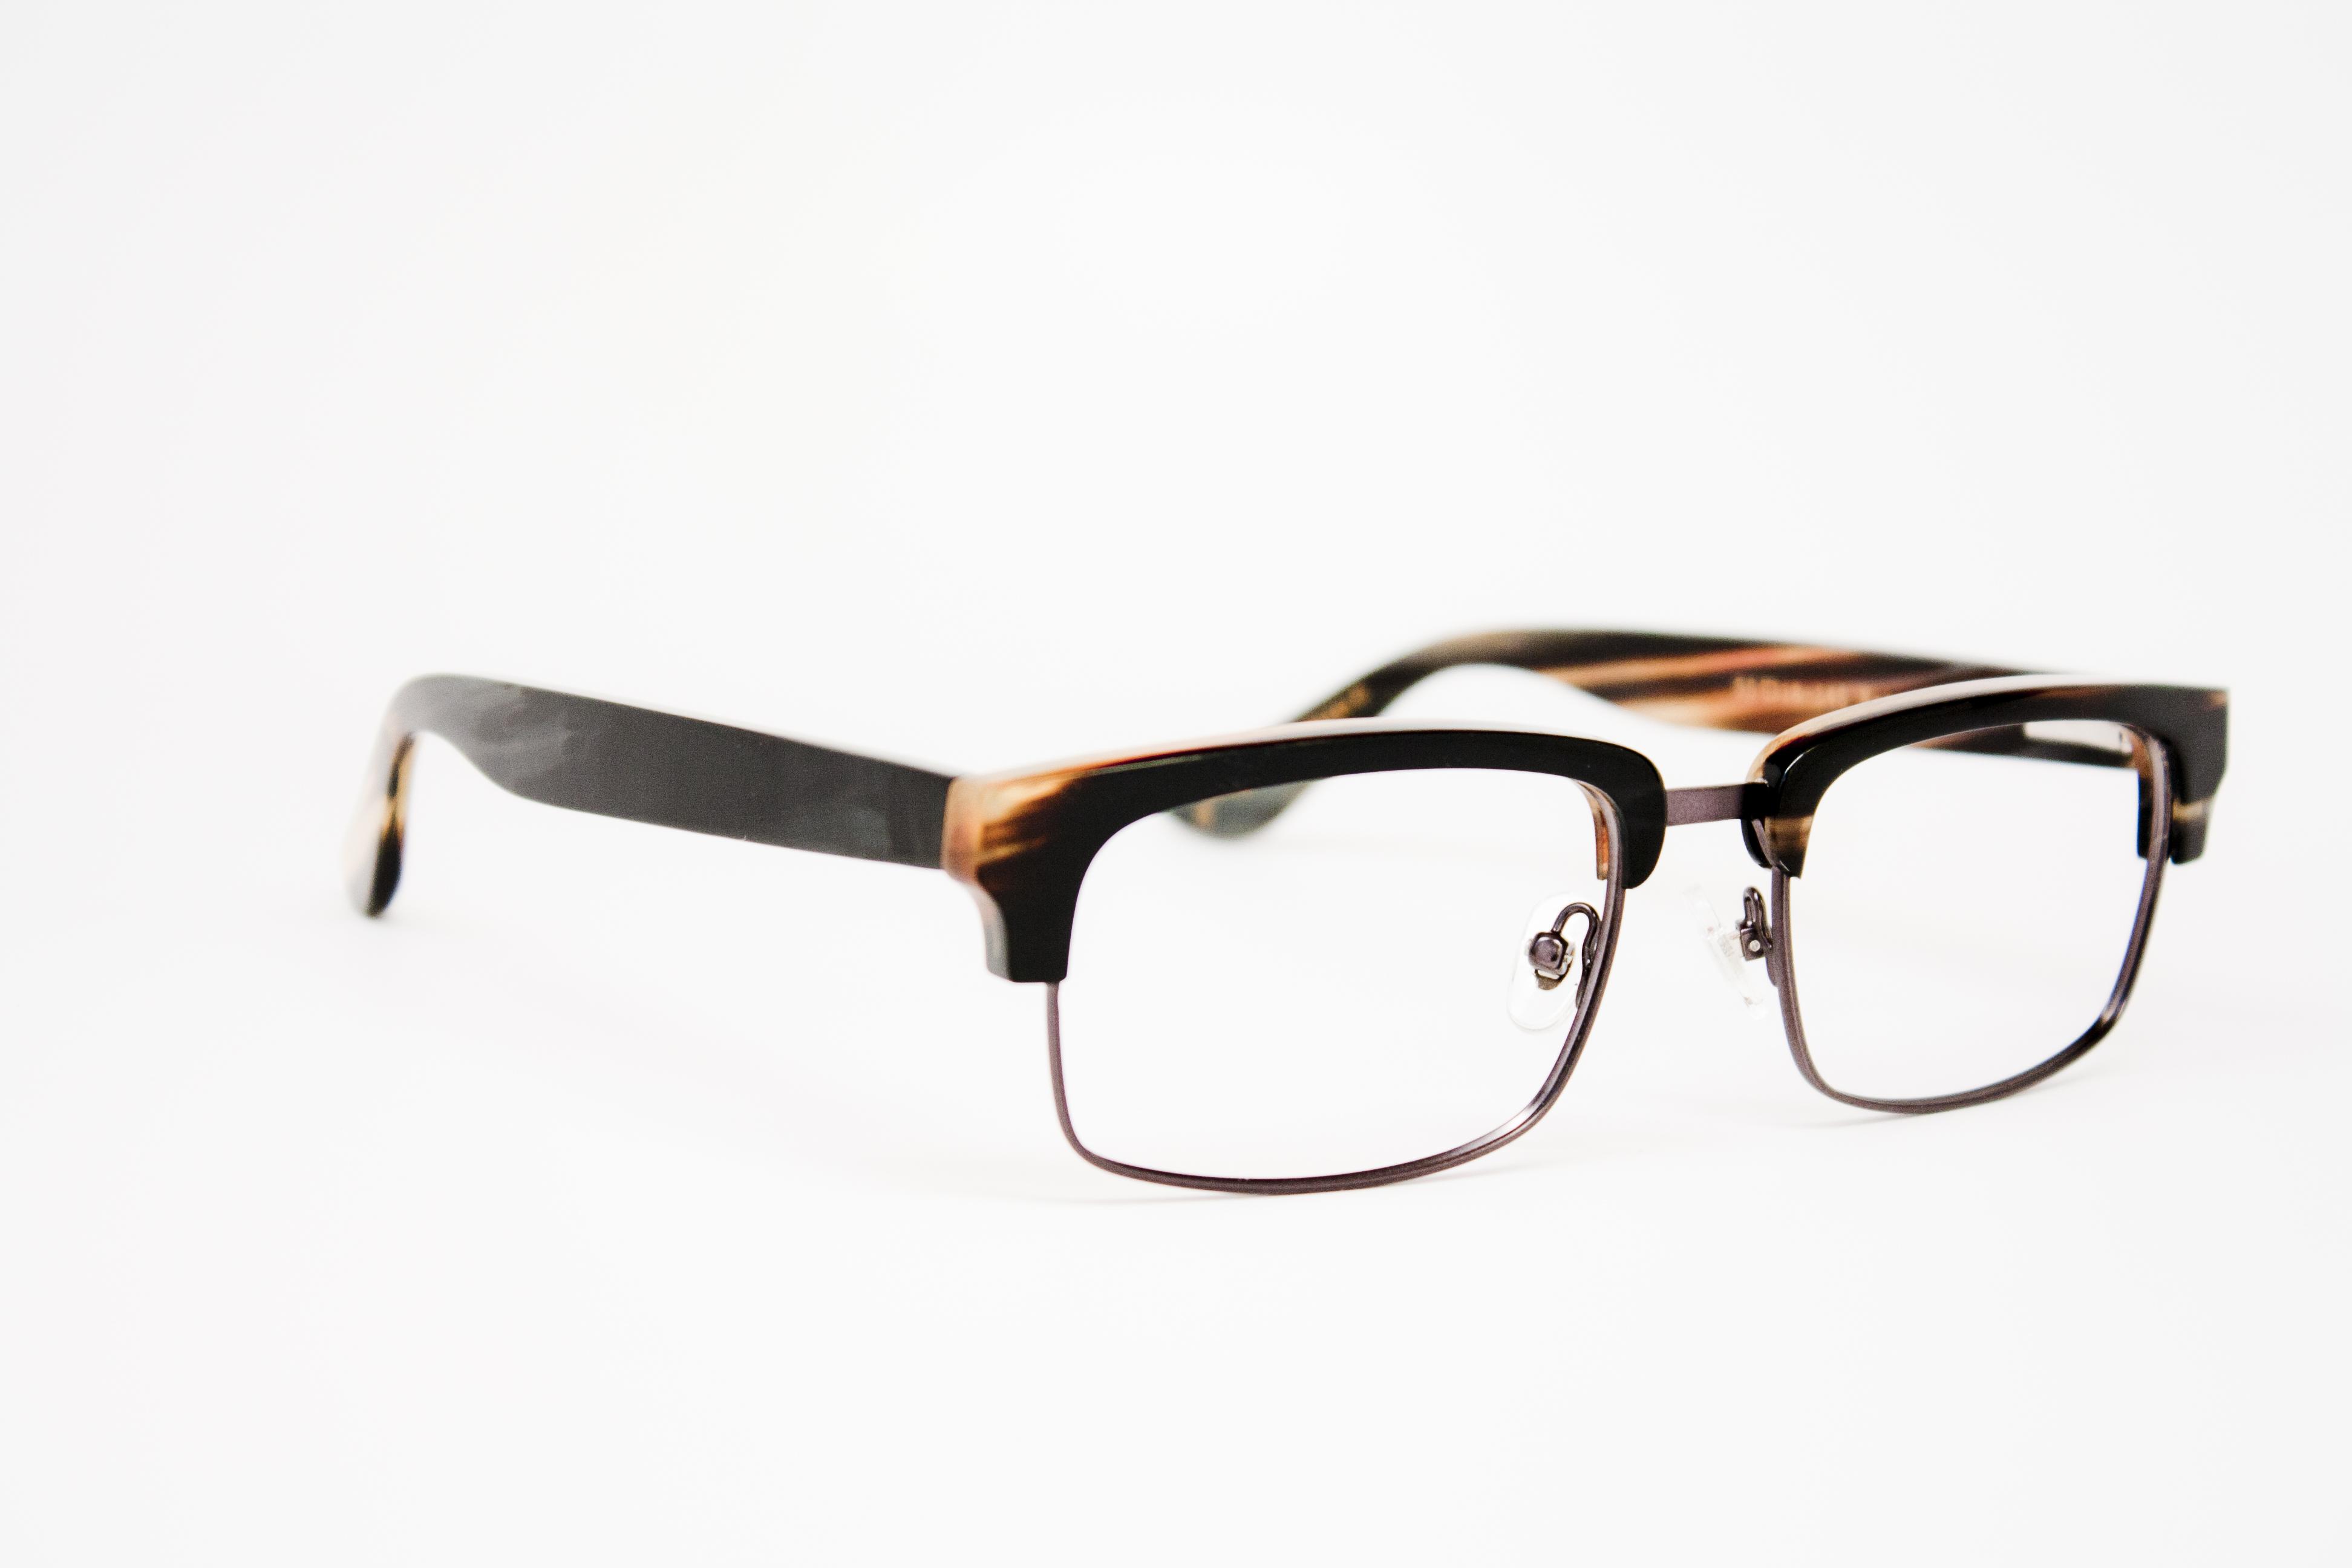 Designer Eyeglass Frames Pittsburgh Pa : Penn Avenue Eyewear Introduces New Buffalo Horn Frame